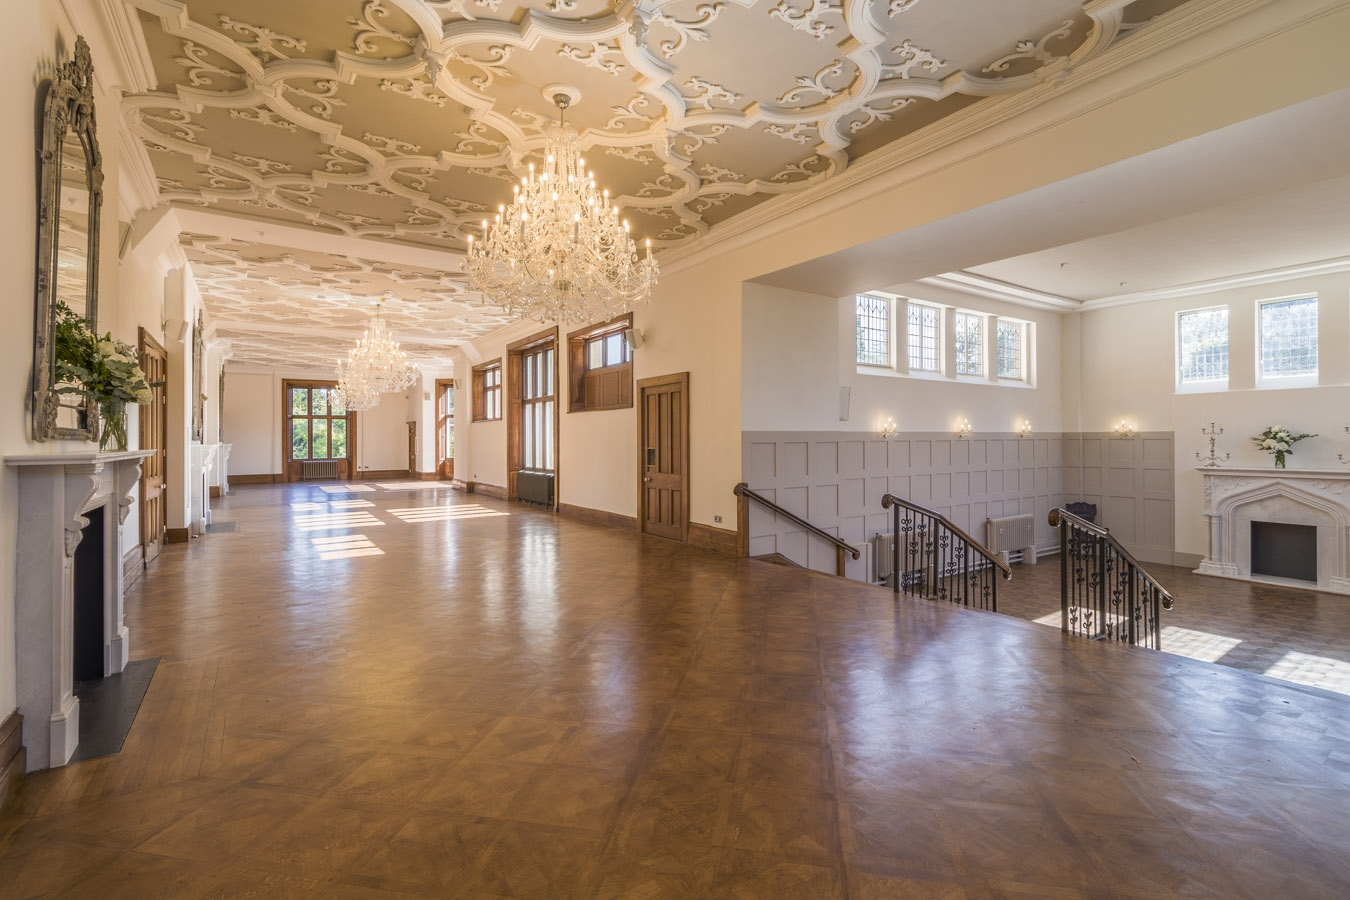 Ballroom Blank Canva